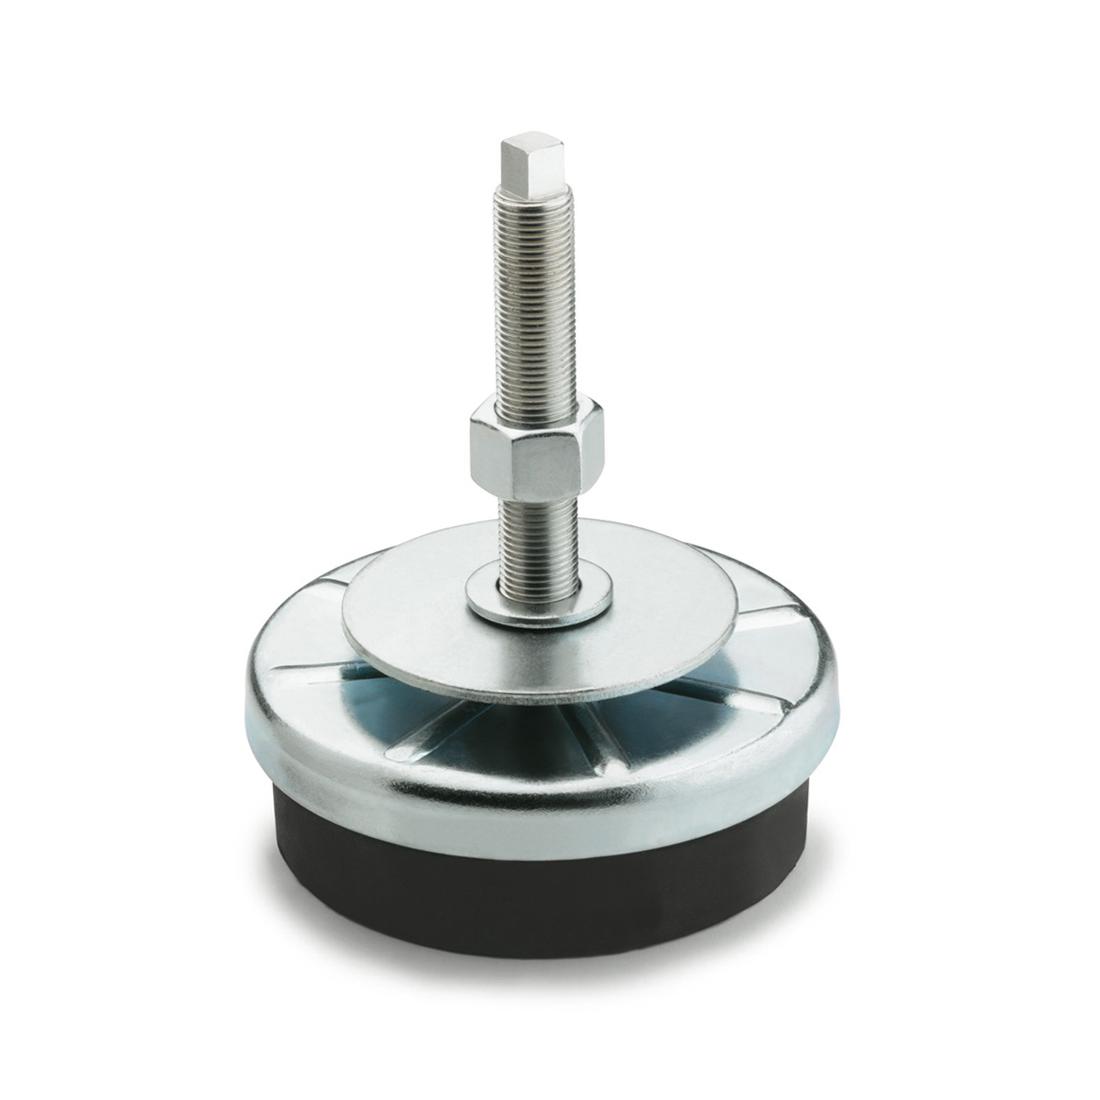 Anti Vibration Adjustable Feet Stainless Steel